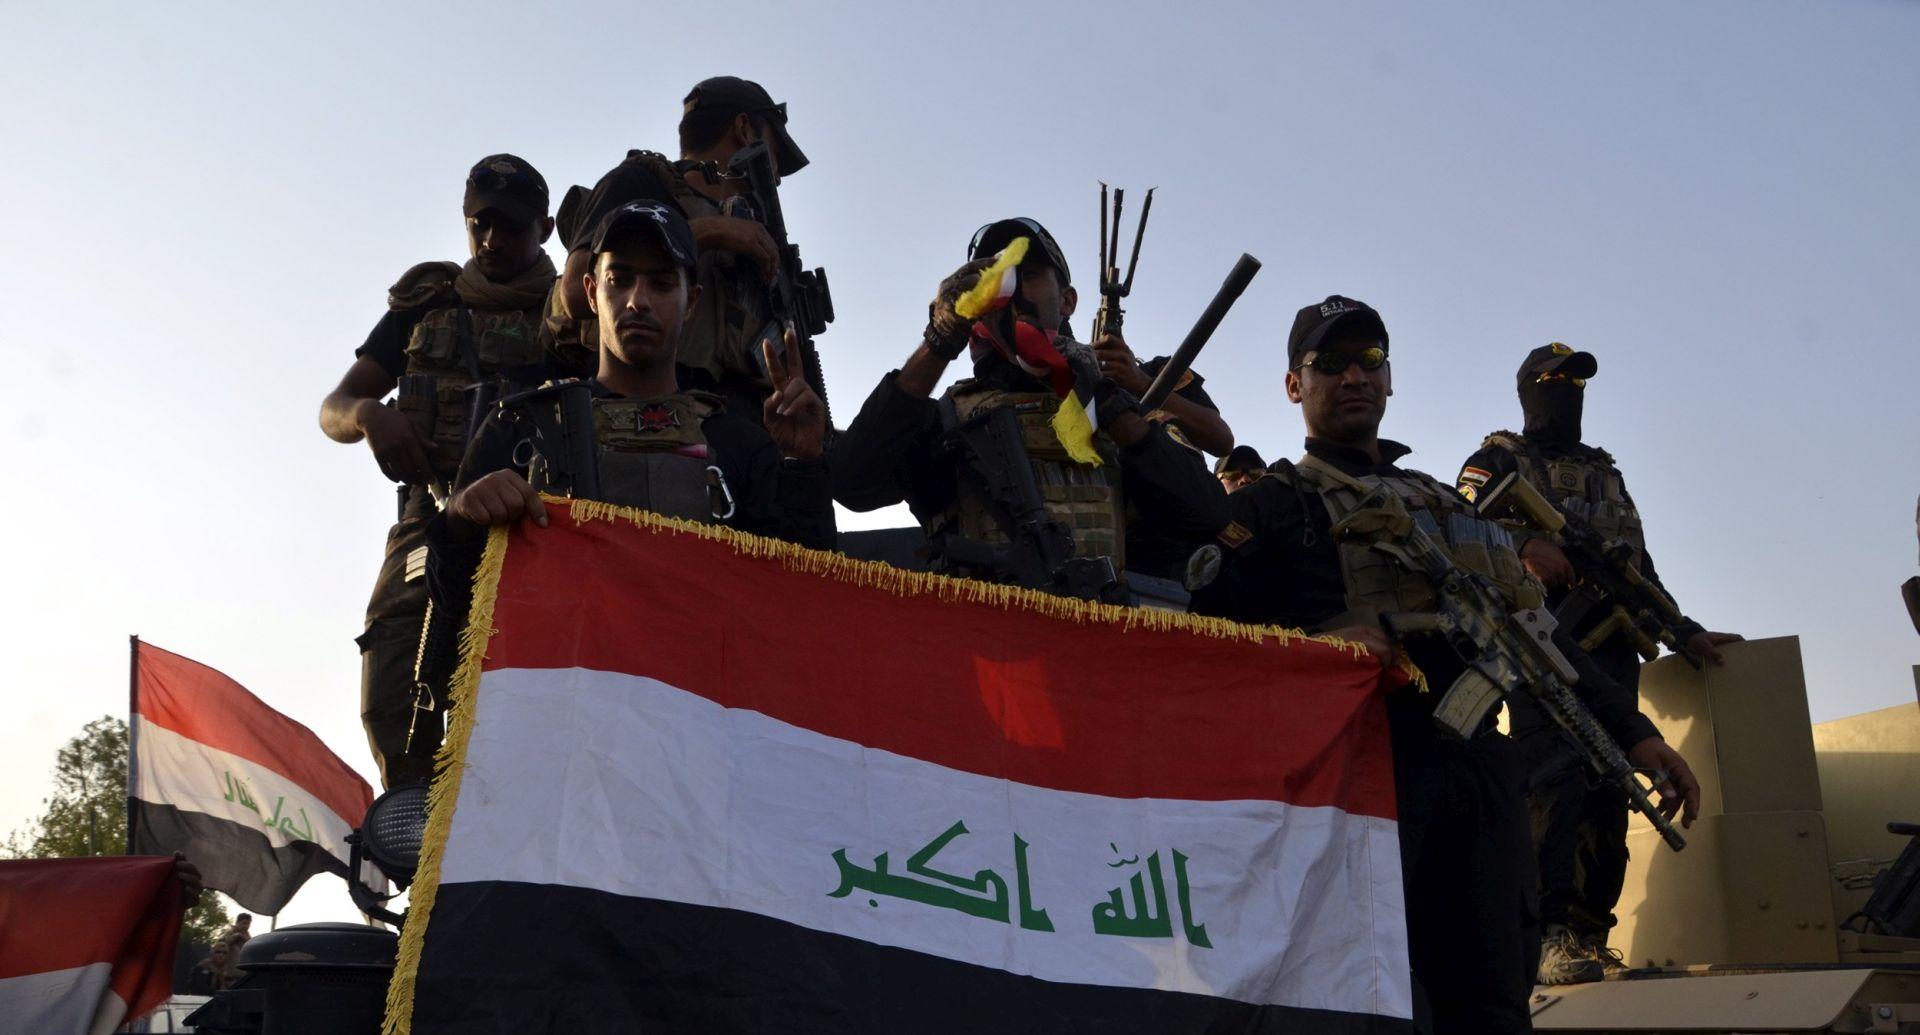 RAT PROTIV DAECHA Vojnom paradom Irak slavi pobjedu nad IS-om